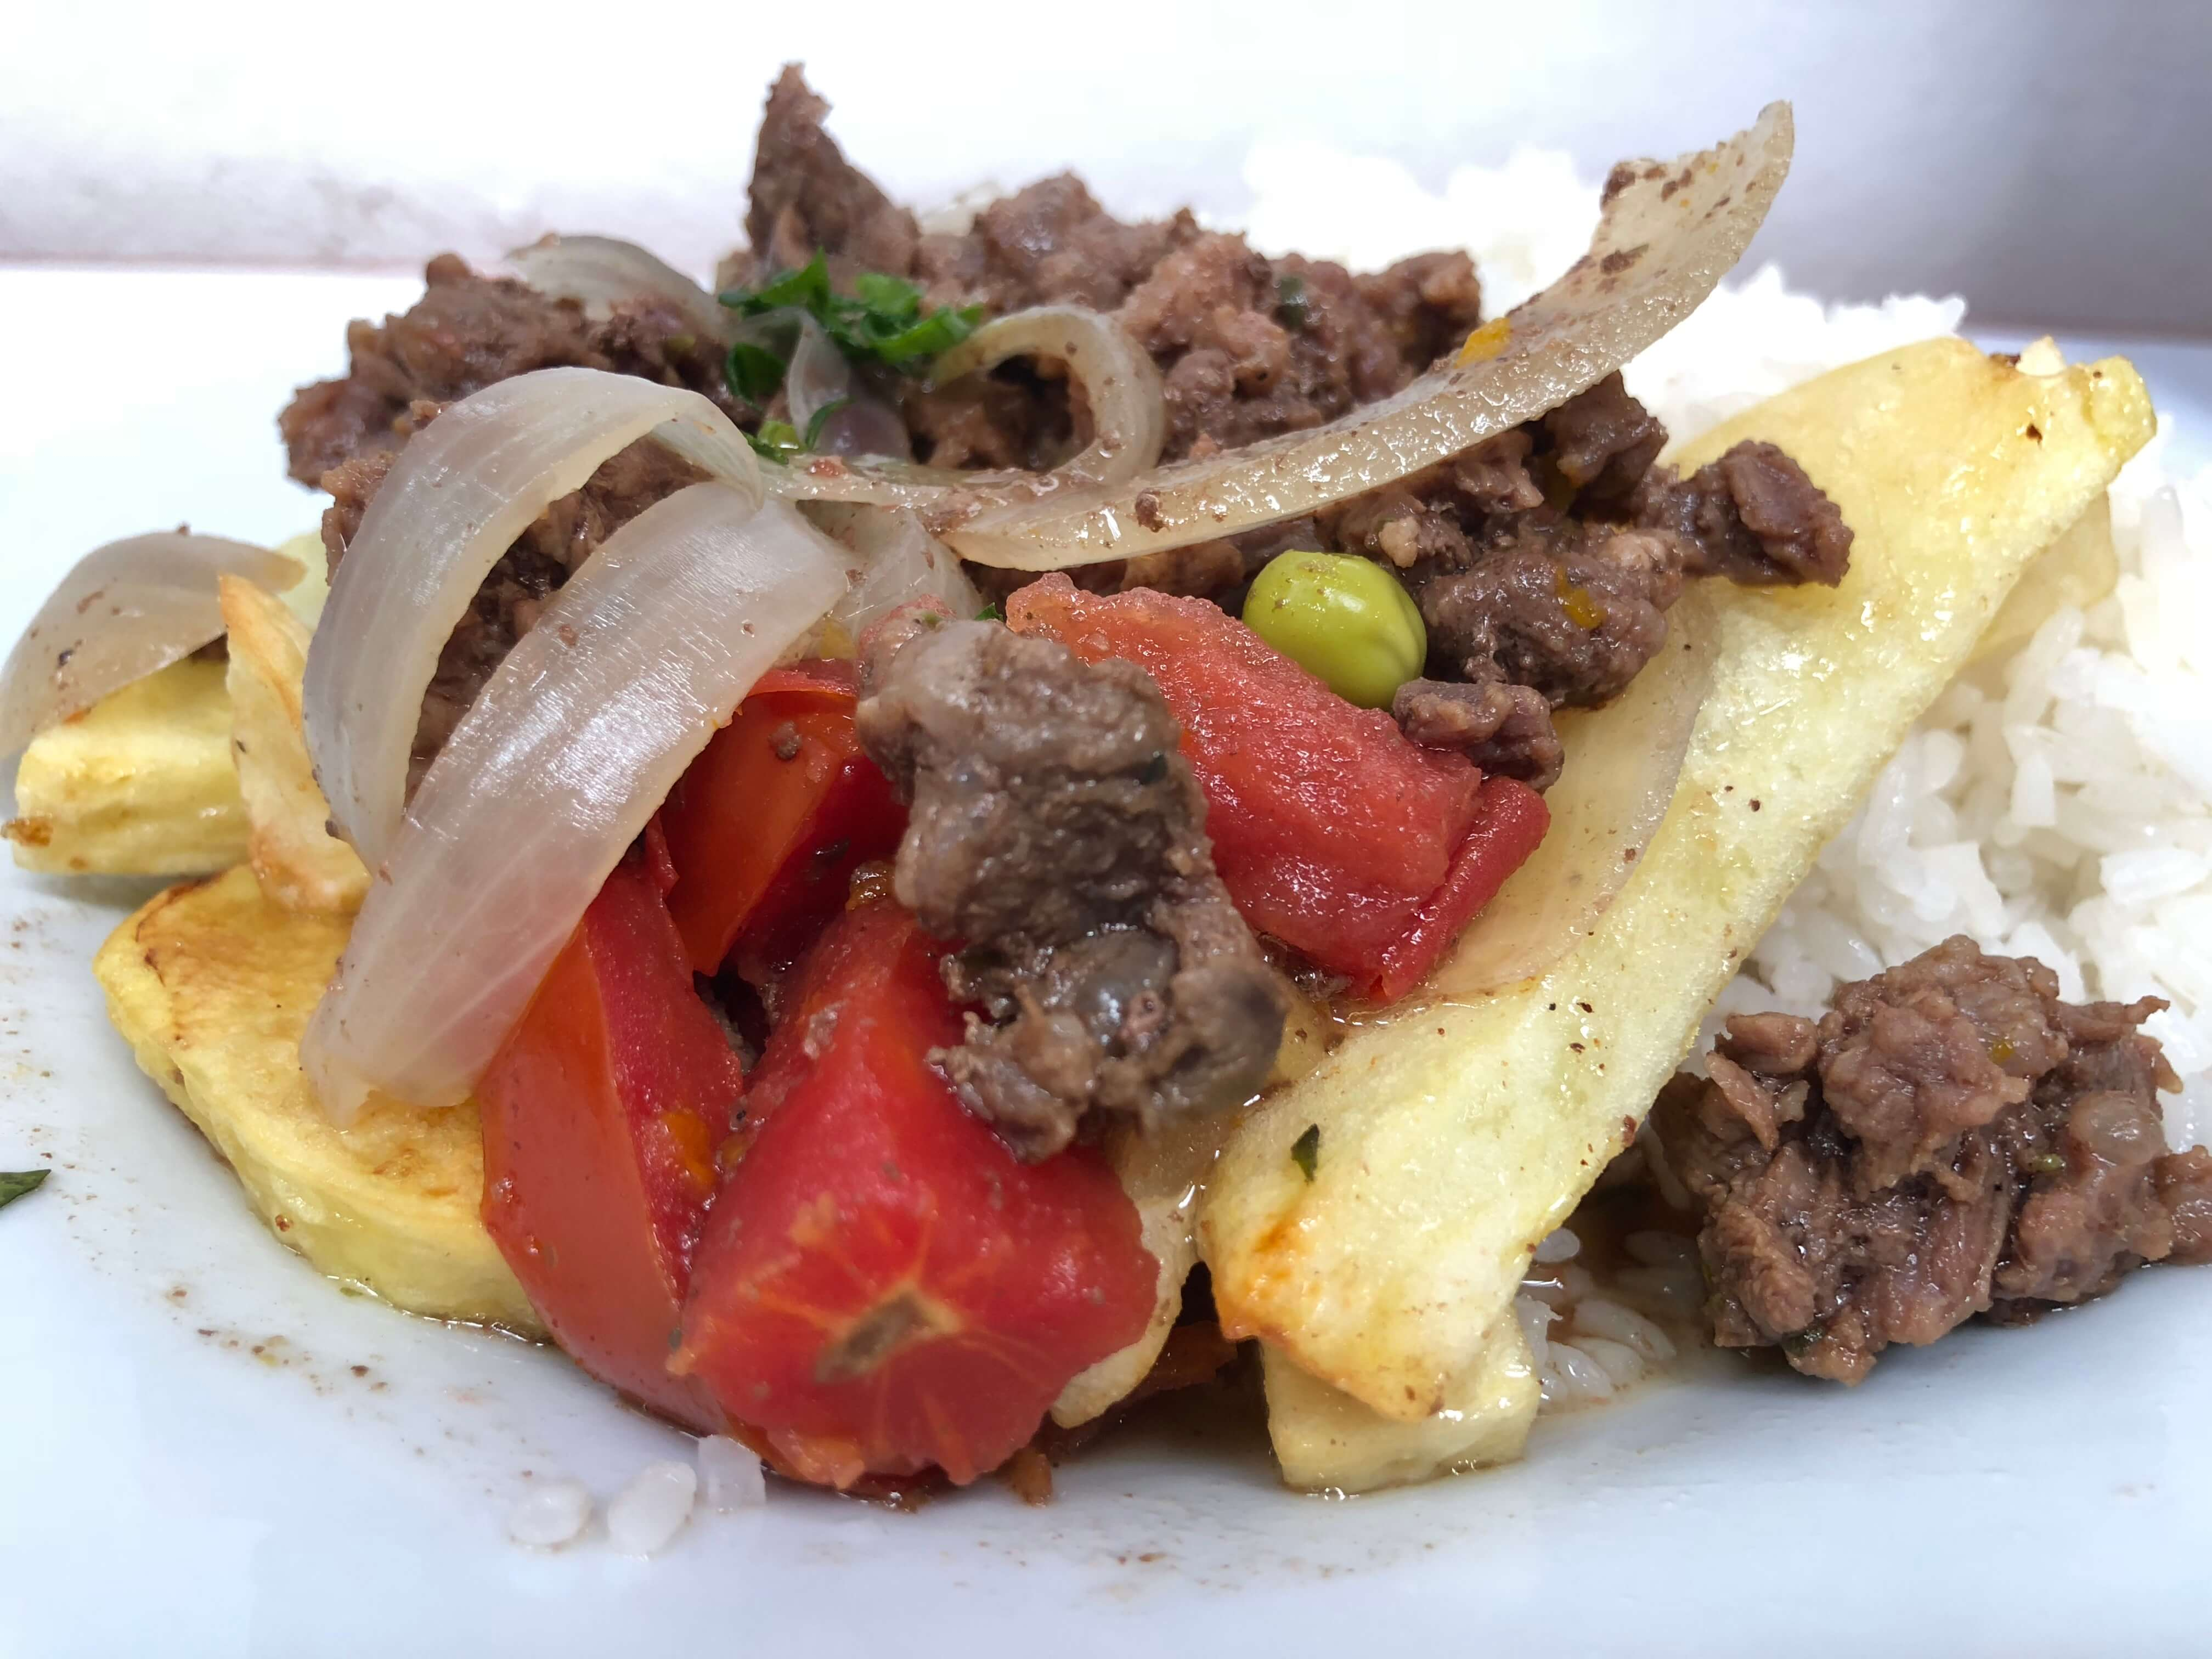 lomo saltado peruvian cuisine peruvian dish peruvian food